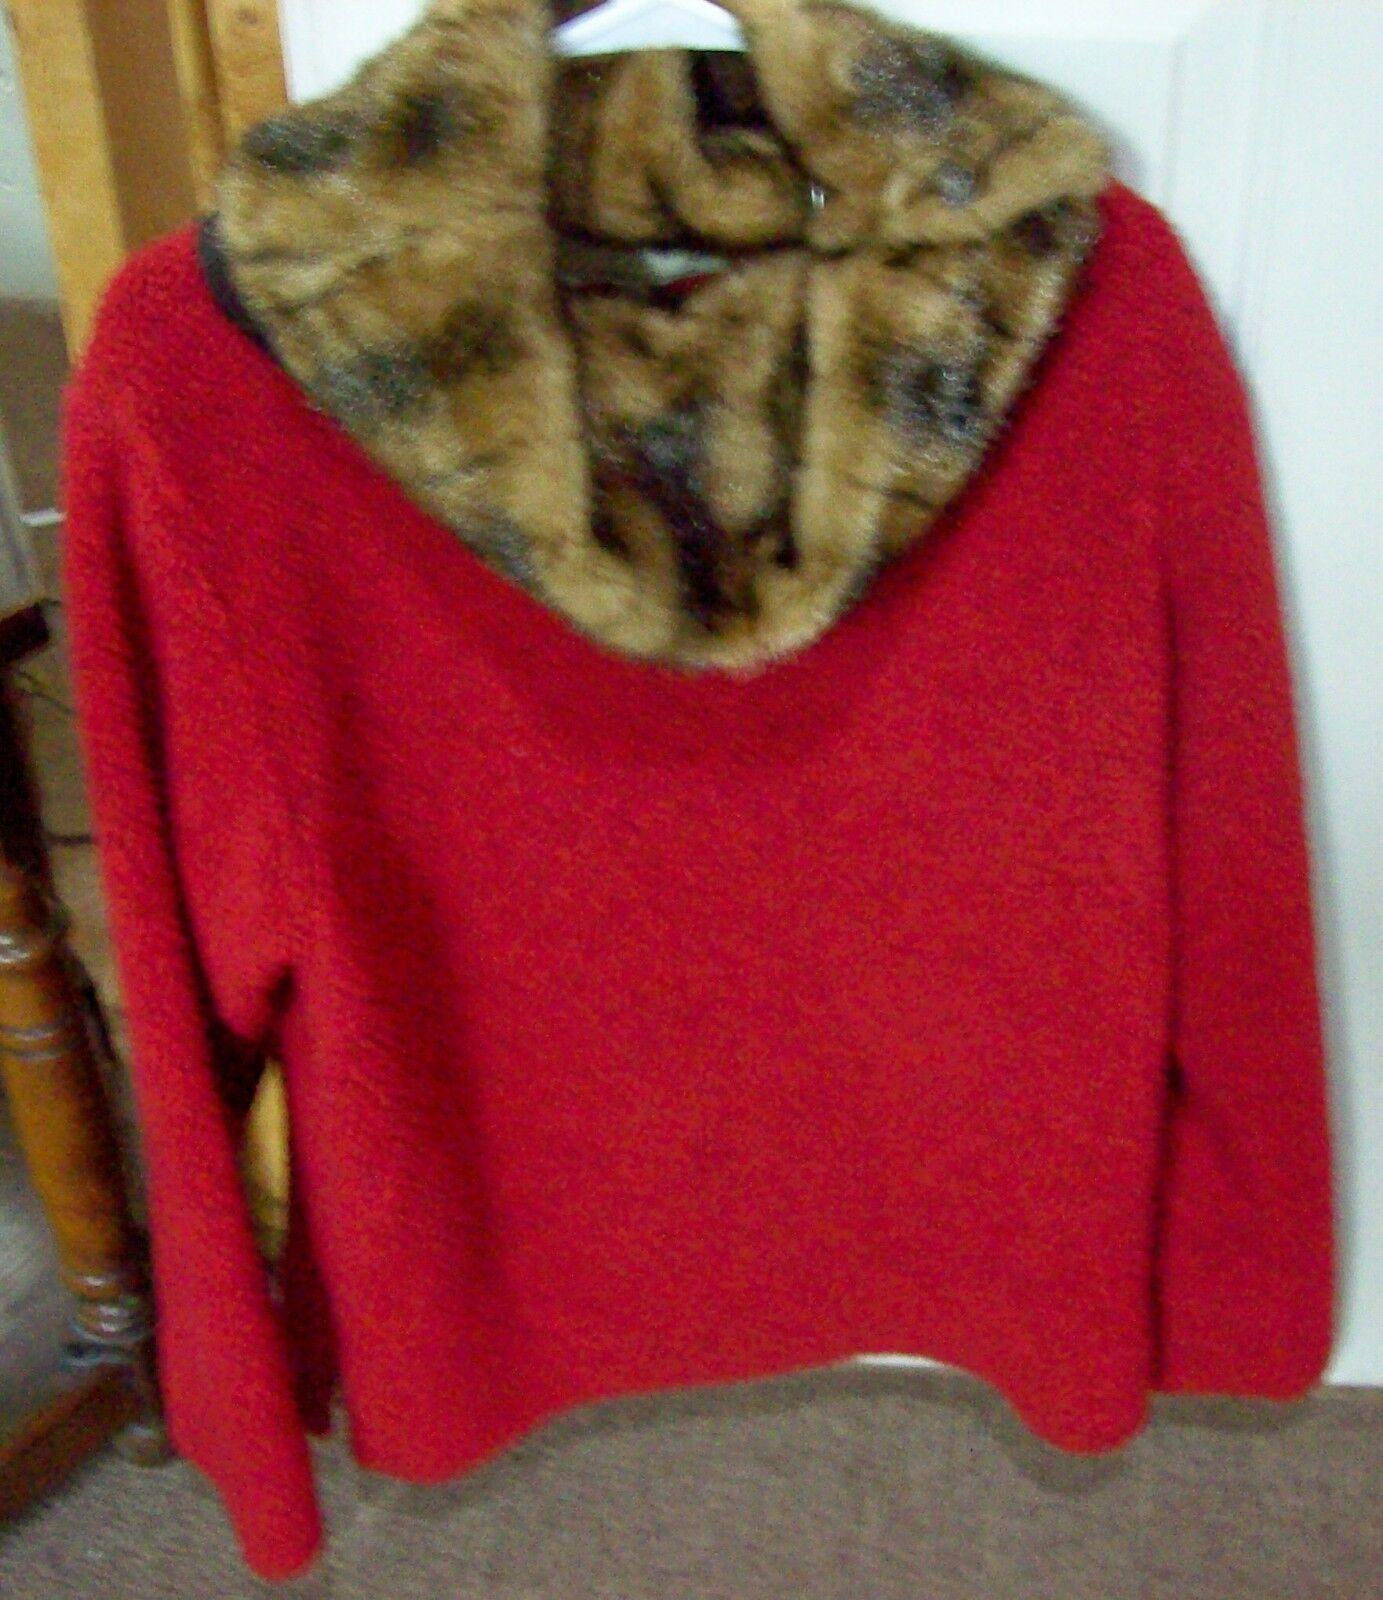 Ladies TASHA POLIZZI for SADDLEBLANKET  Red Sweater w  MINK Collar  Size S